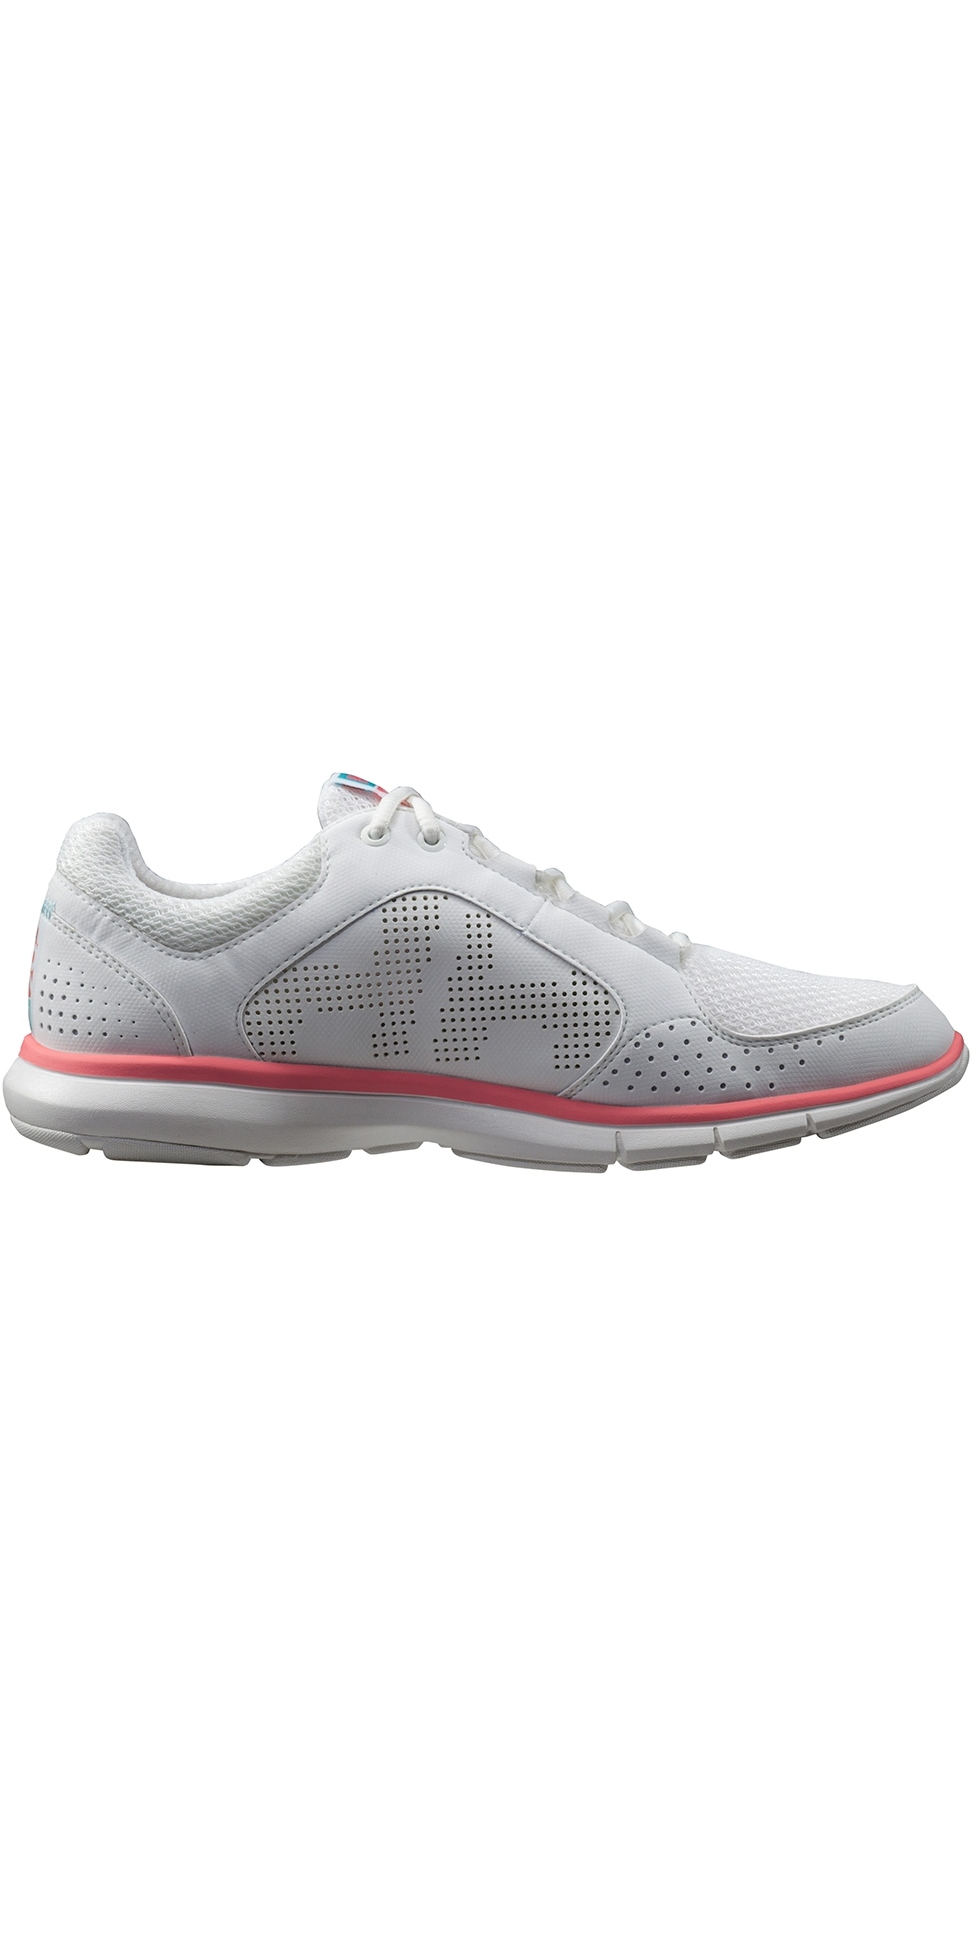 2019 Helly Hansen Womens Ahiga V3 Hydropower Shoe Off White / Shell Pink 11216